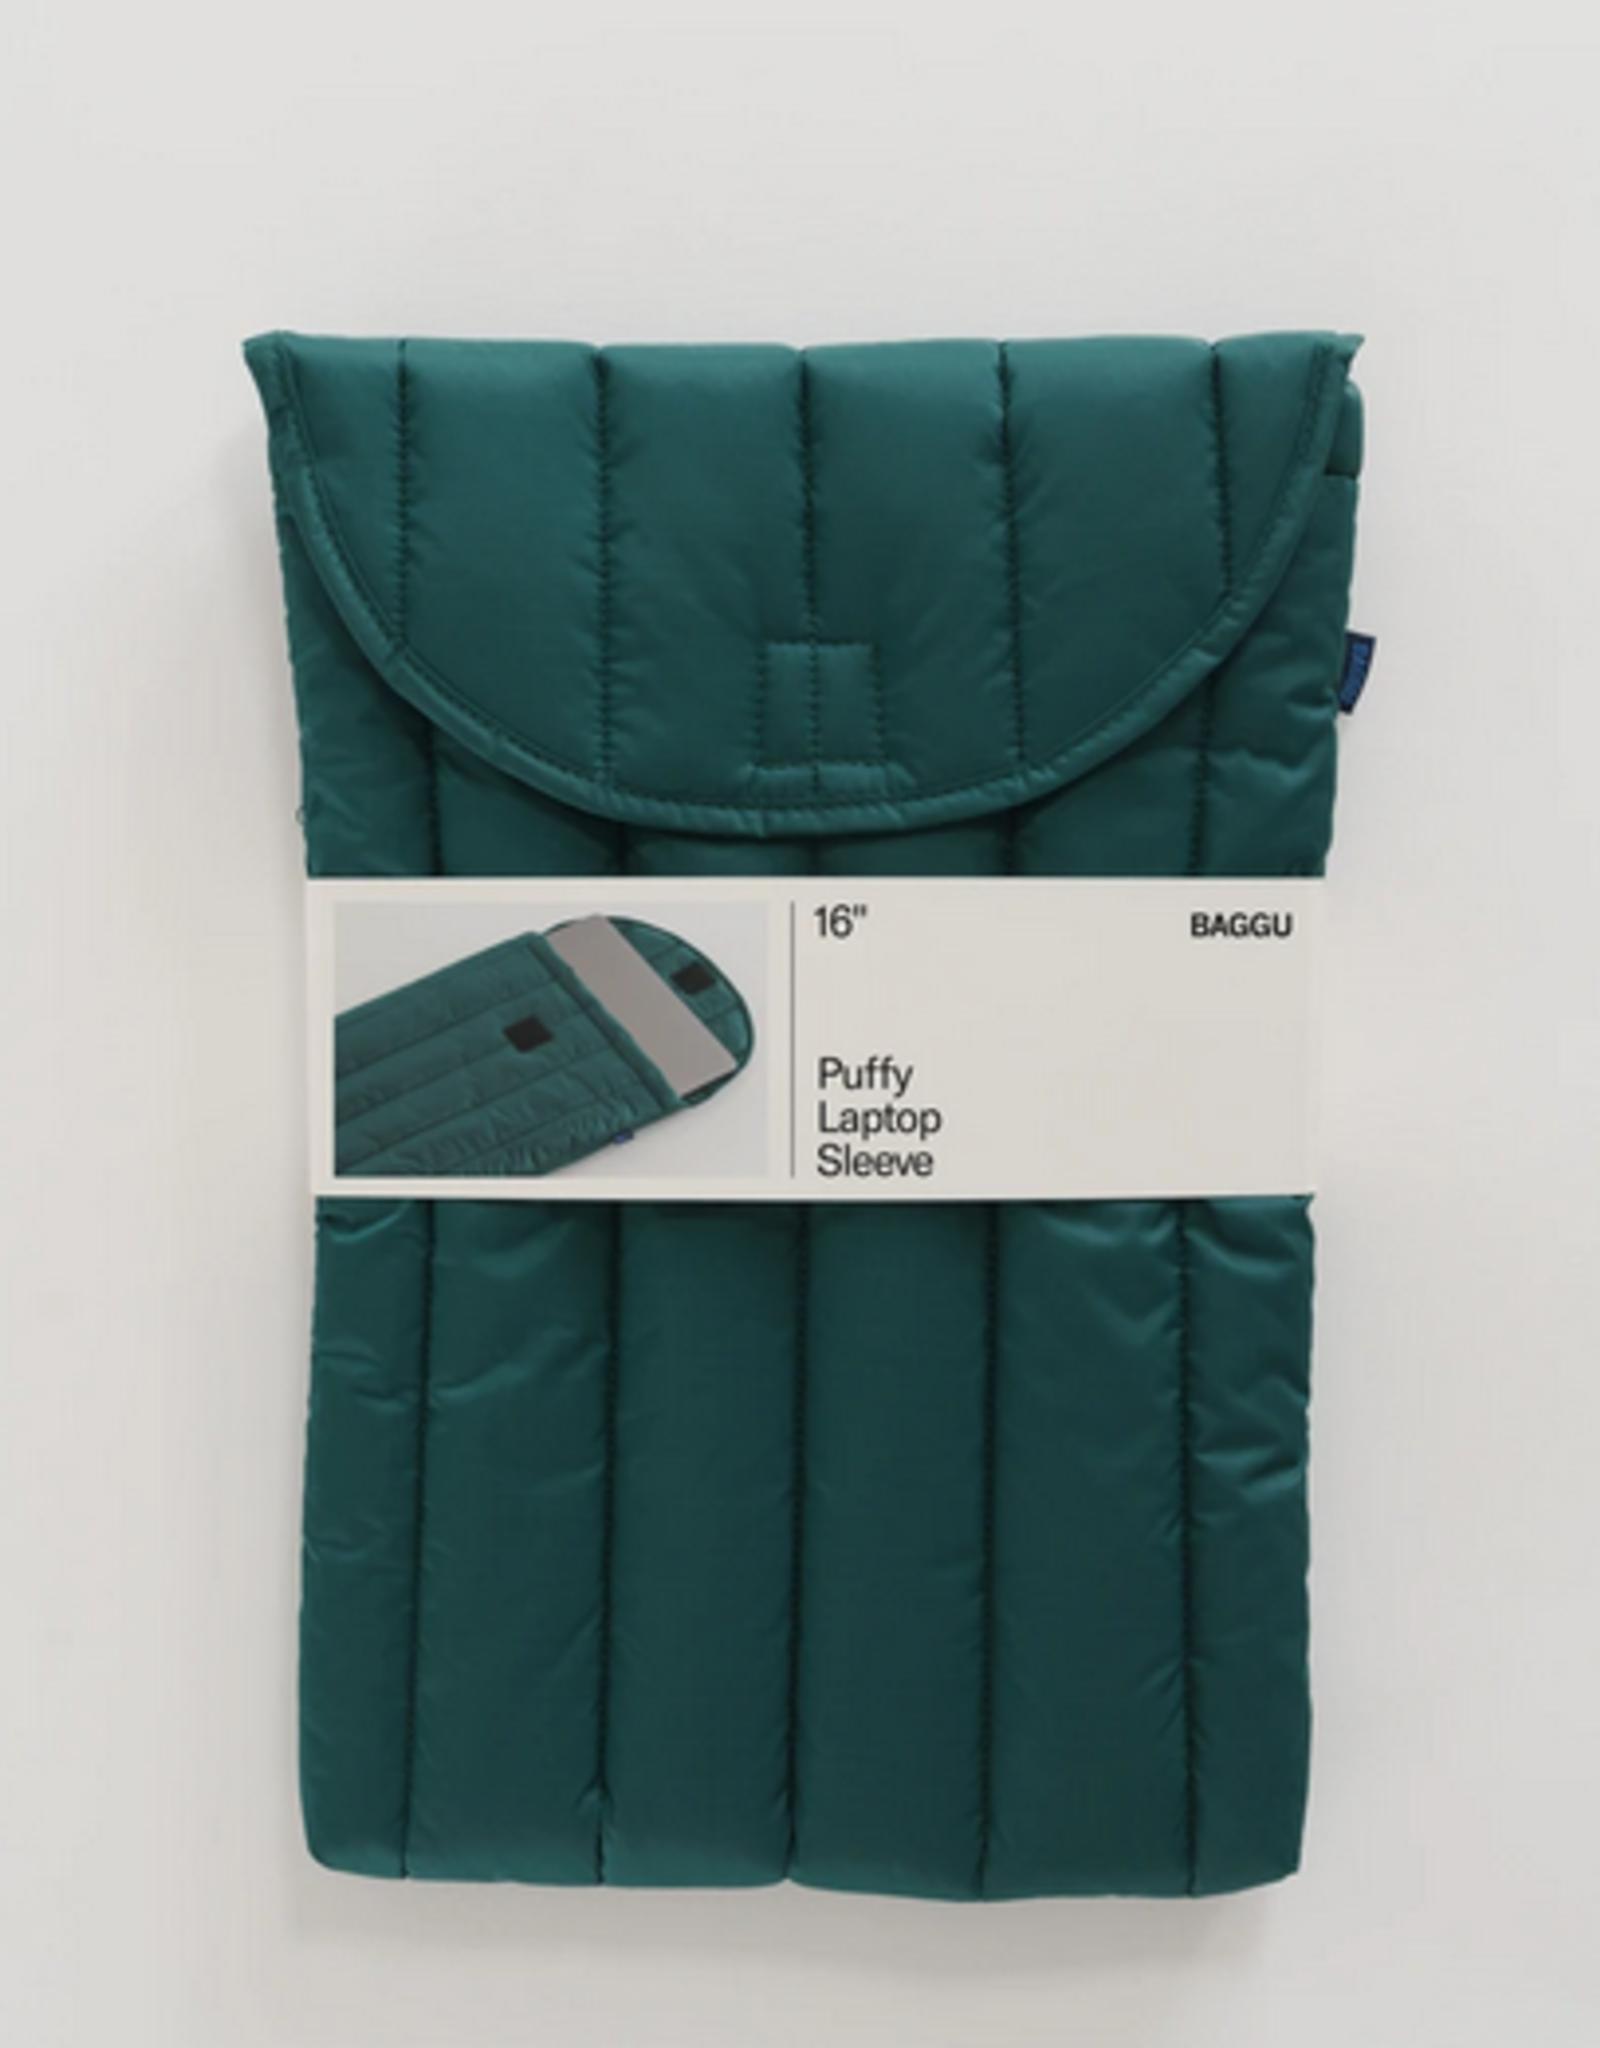 Baggu Puffy Laptop sleeve Malachite 16 Inch